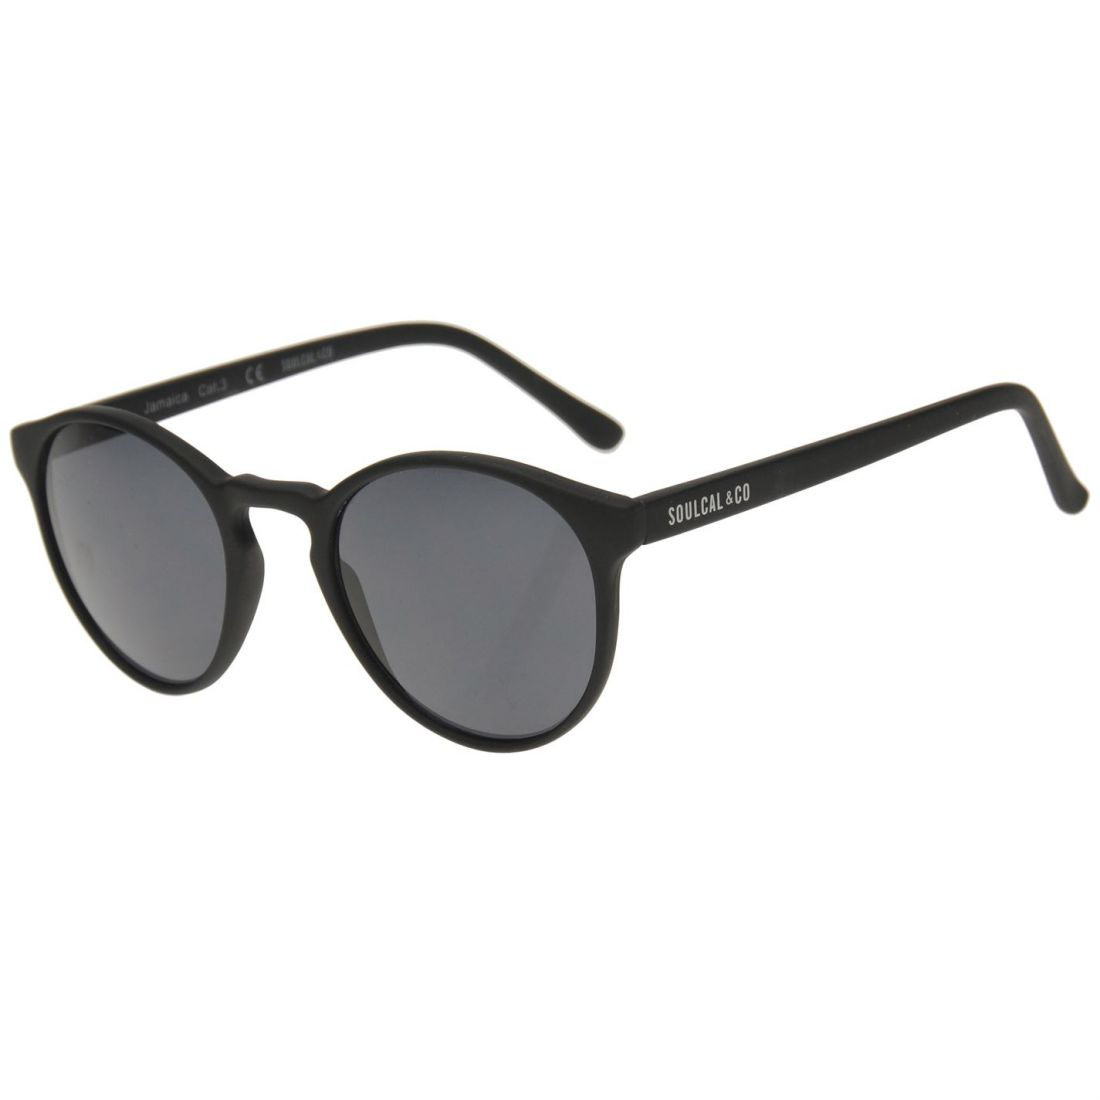 SoulCal Mens Jamaica S G Sunglasses 5057816466068  4798af2519